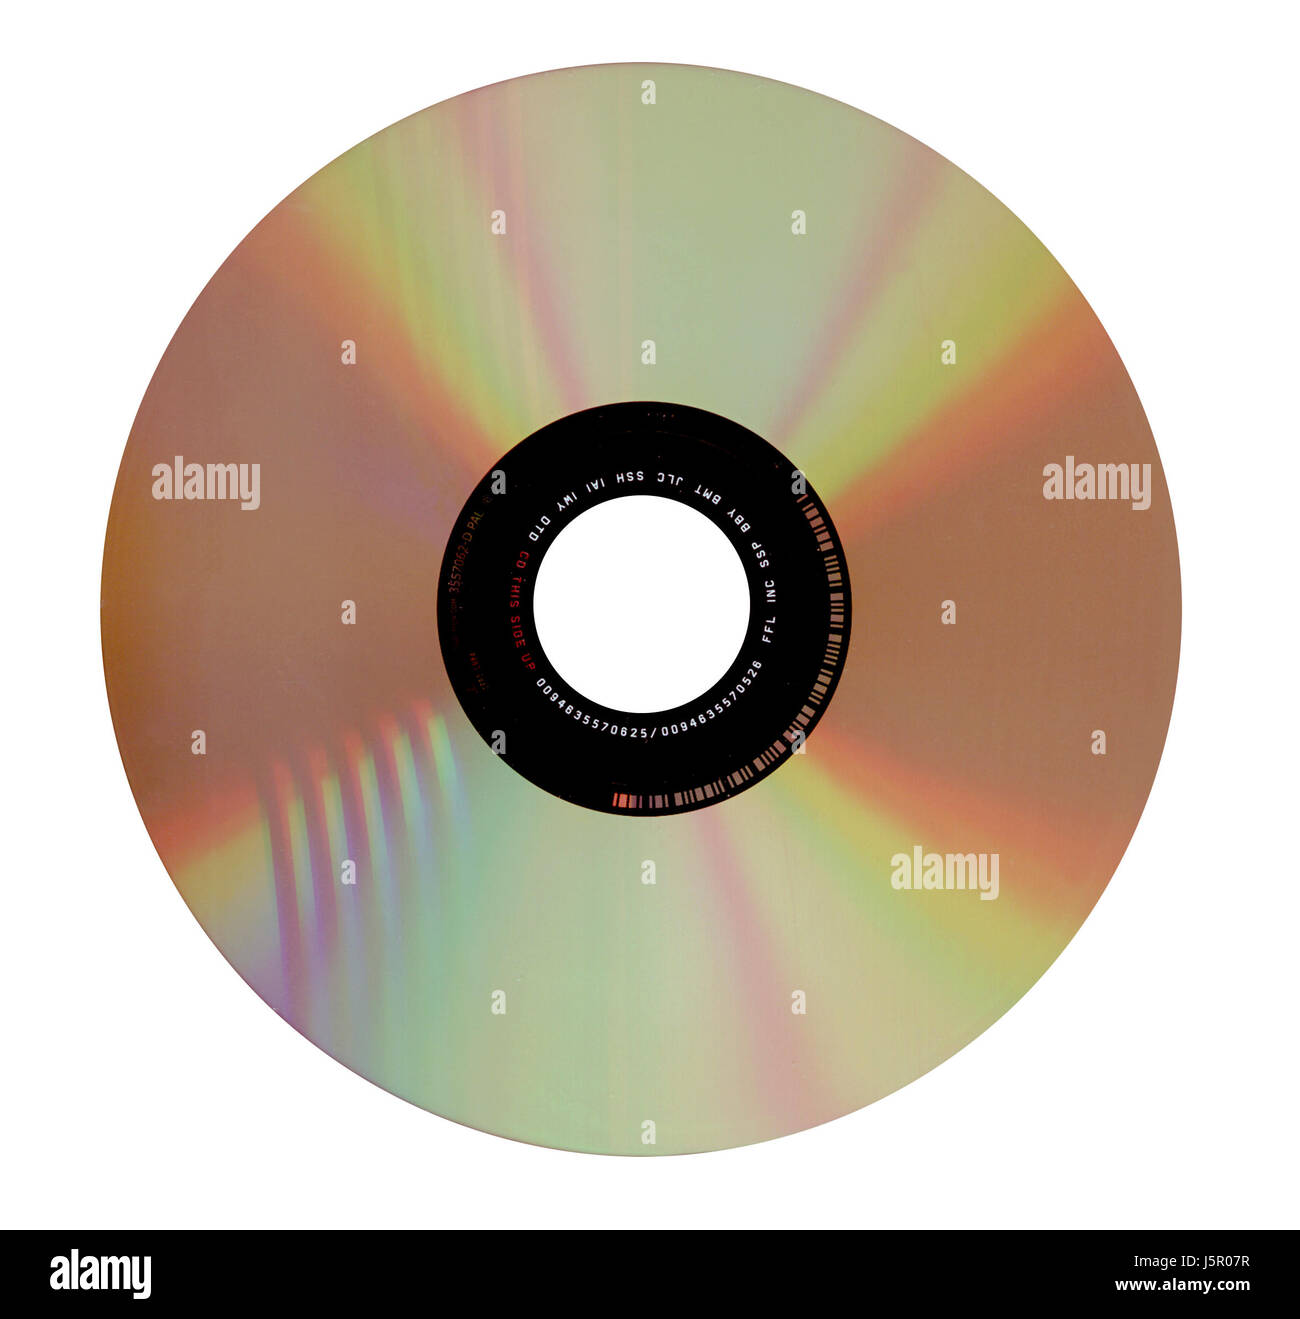 optional medium store dvd CD burn cd-r cd-rw disc copieren - Stock Image